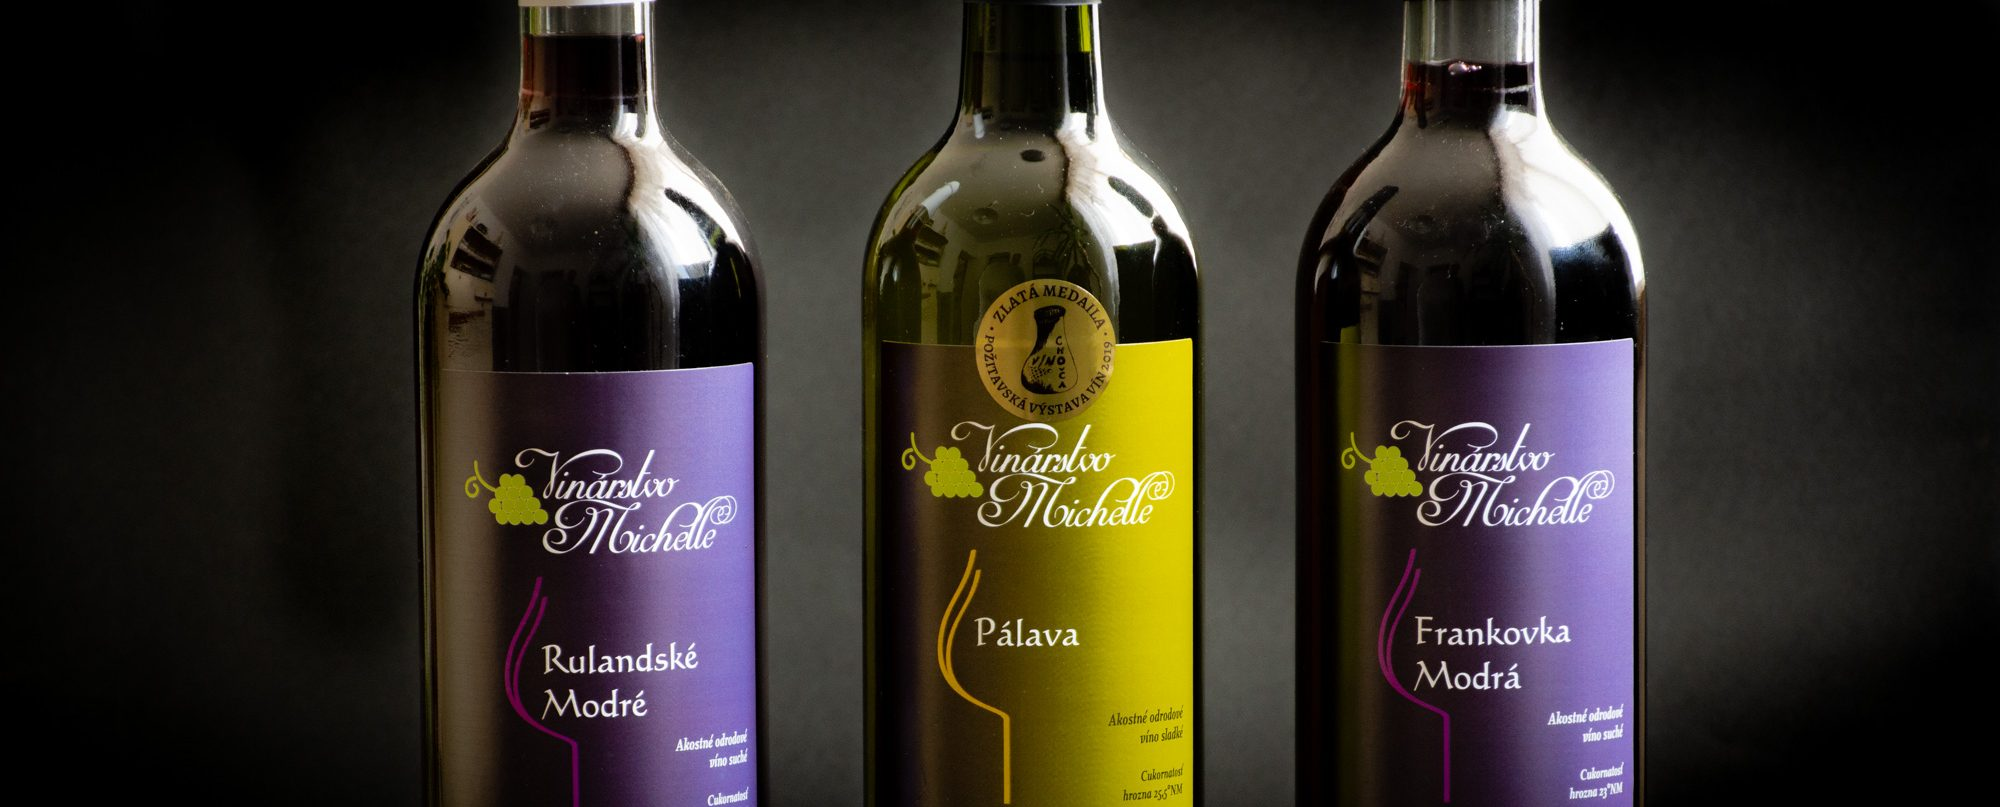 vinárstvo michelle